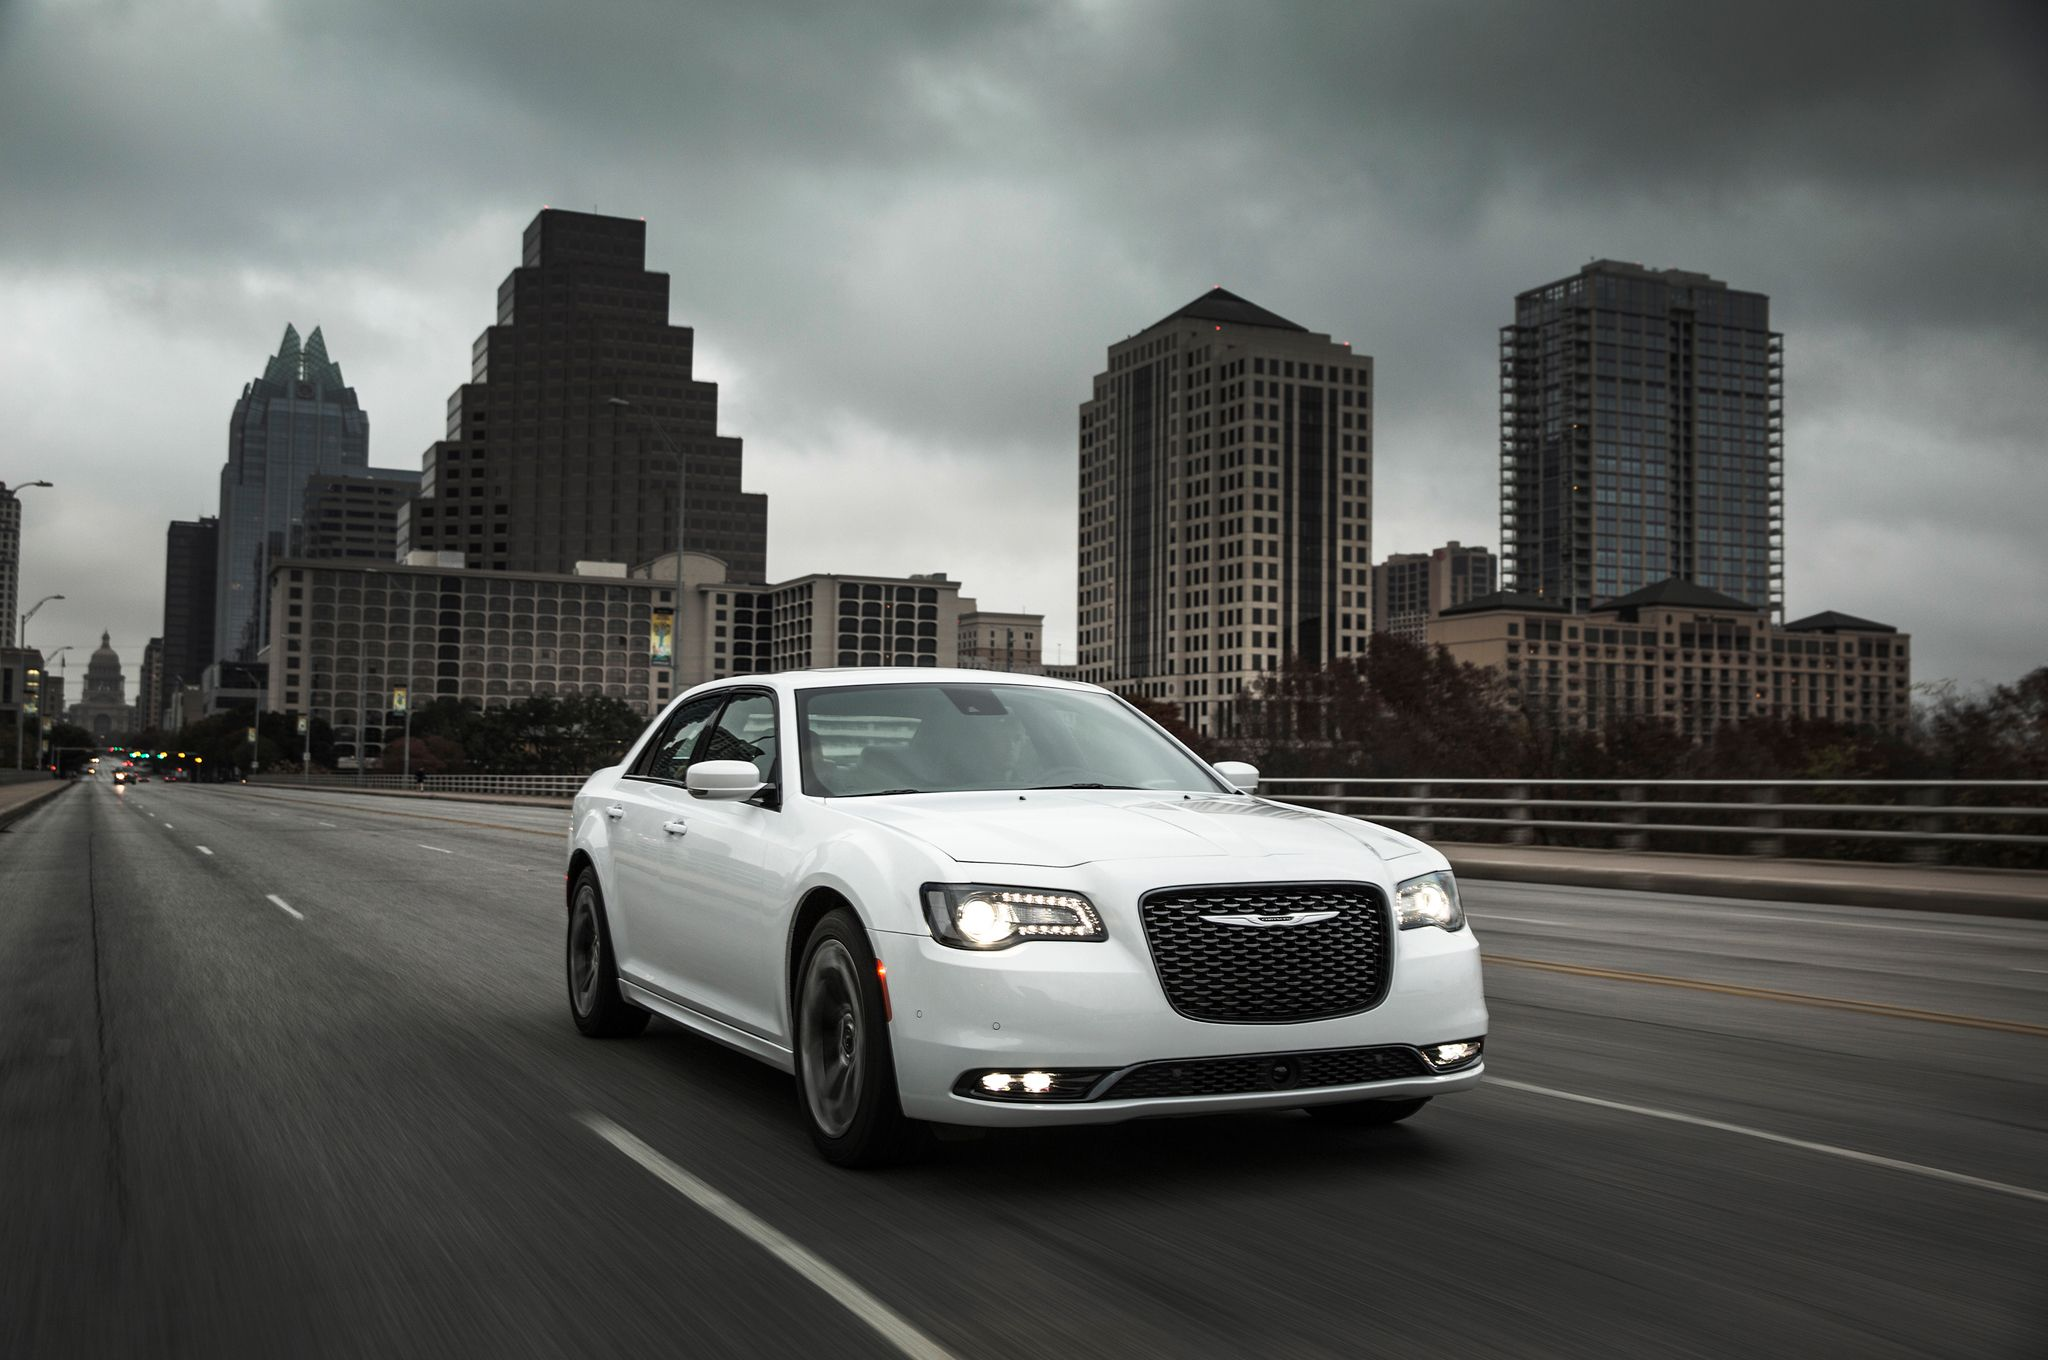 Chrysler 300 Wallpapers Top Free Chrysler 300 Backgrounds Wallpaperaccess